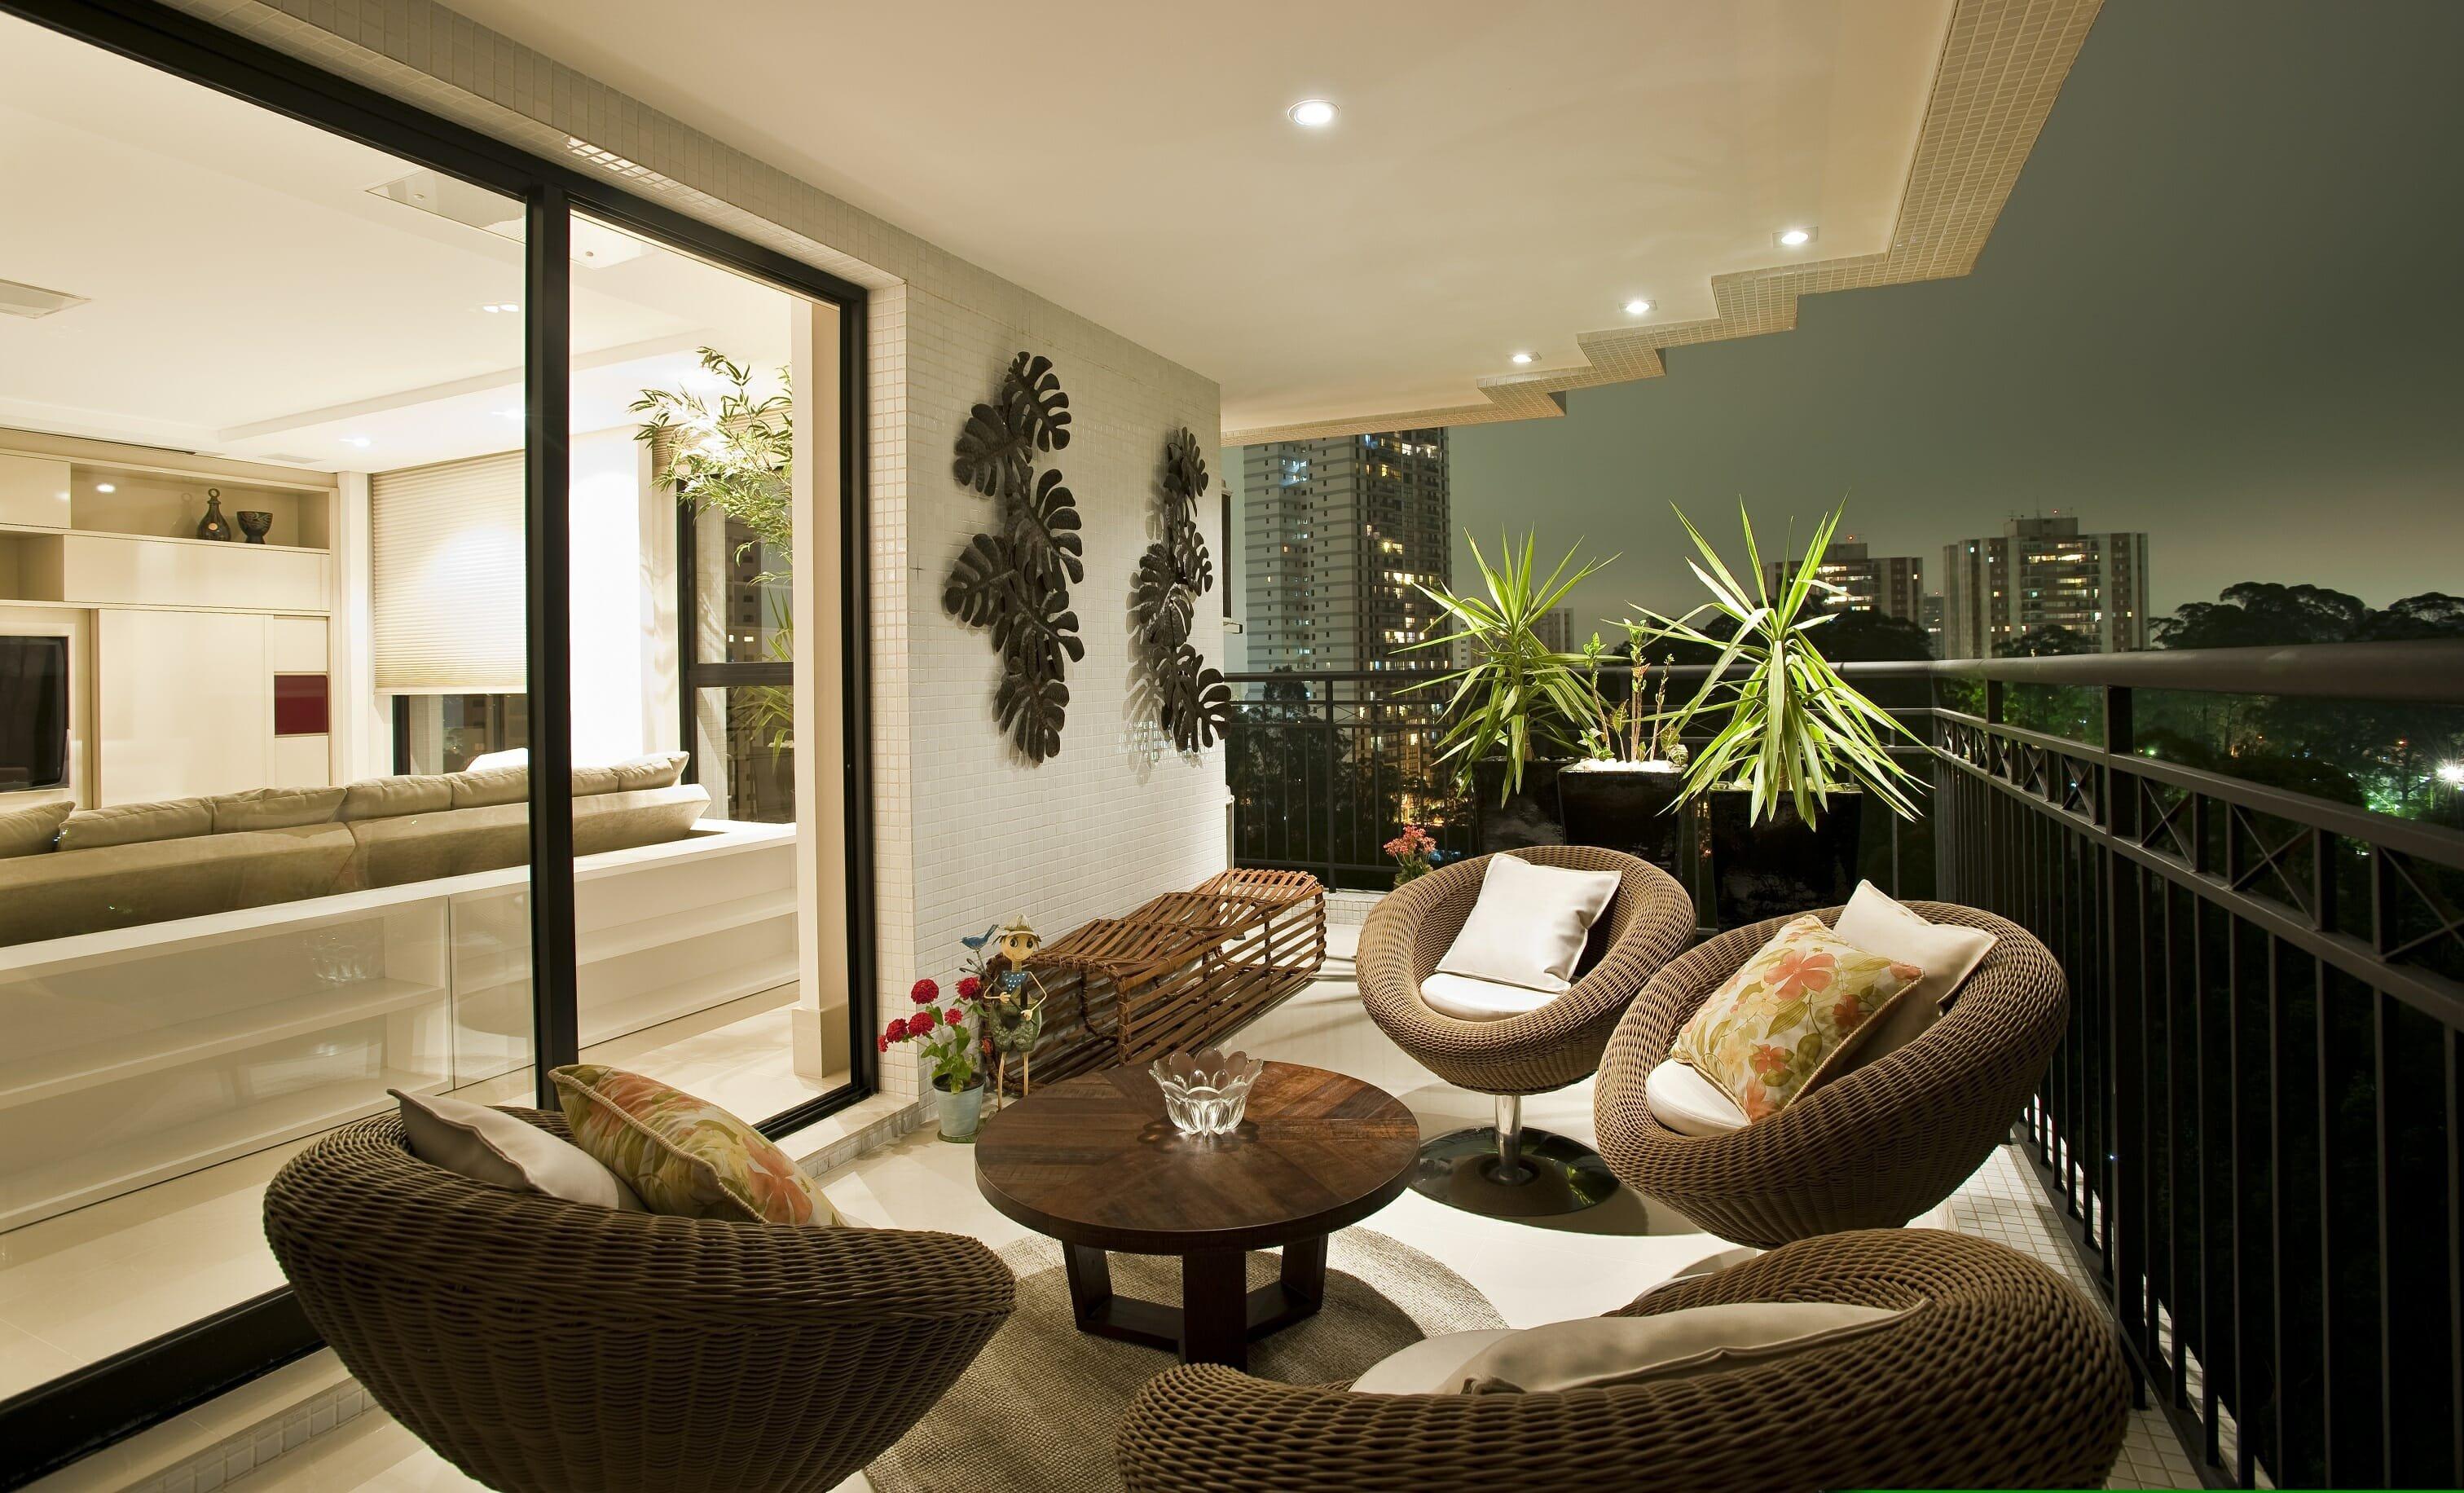 orlando-interior-decorator-maria-alice-aguilar-Residential-balcony-Decoration